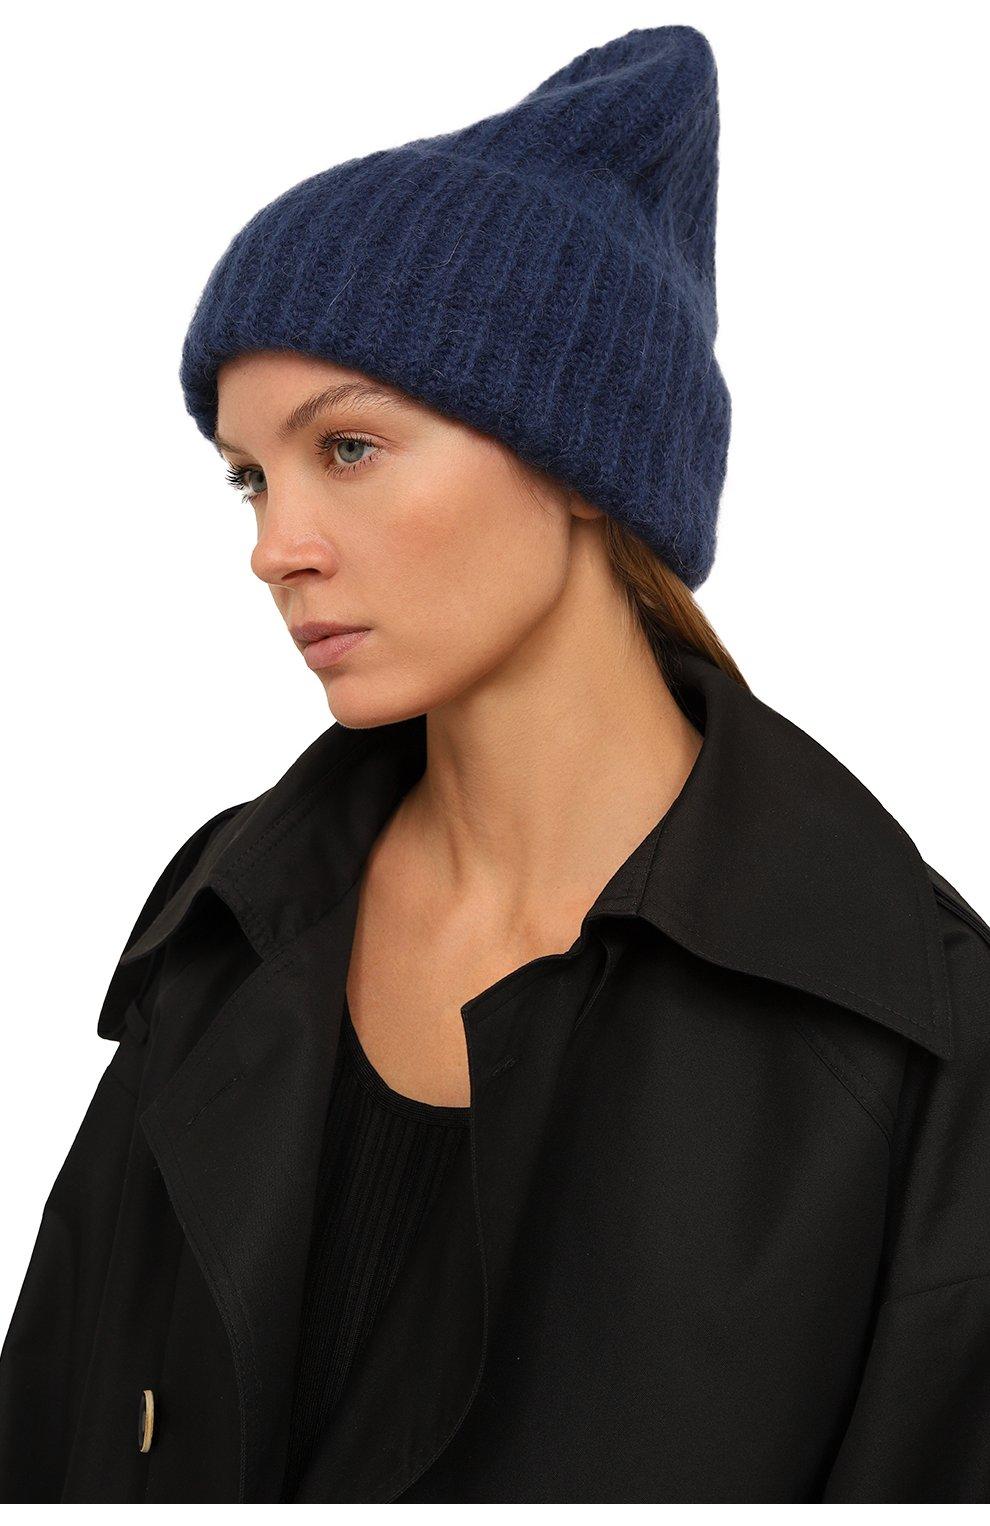 Женская шапка TAK.ORI темно-синего цвета, арт. AC043MW018PF17 | Фото 2 (Материал: Текстиль, Шерсть, Синтетический материал)